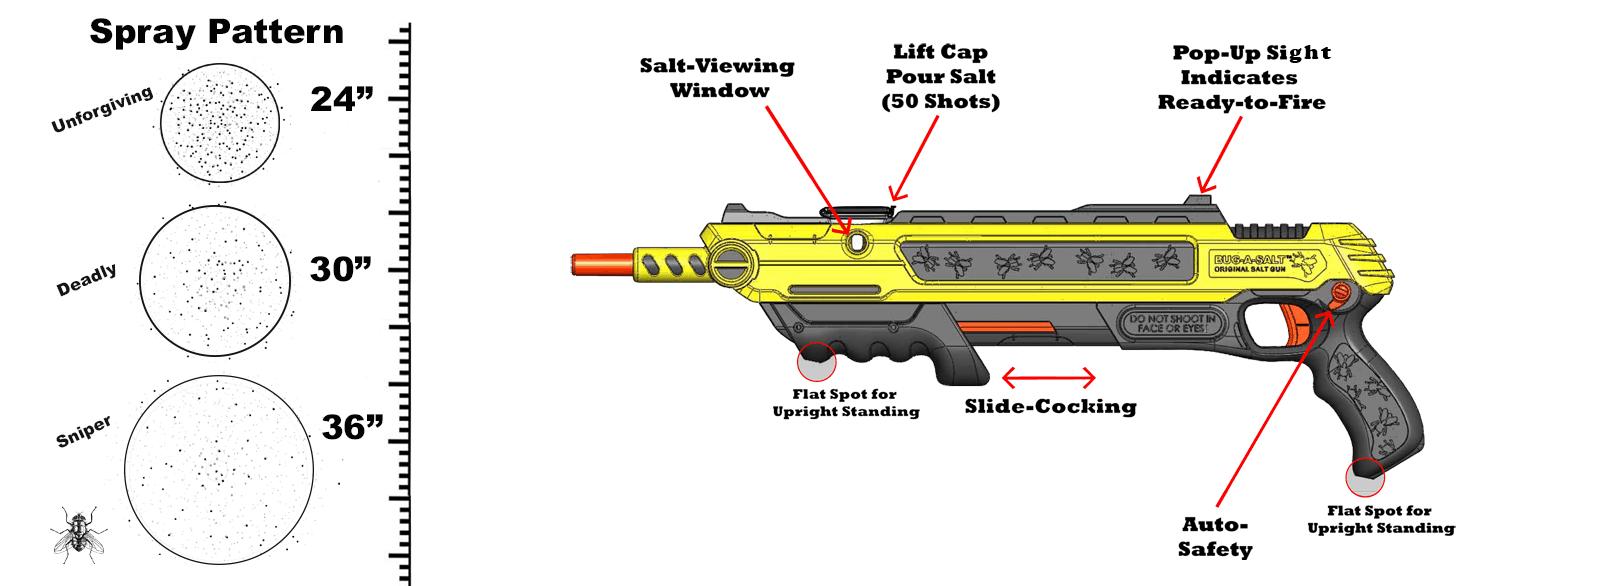 Bugasalt Gun Spray Patterns